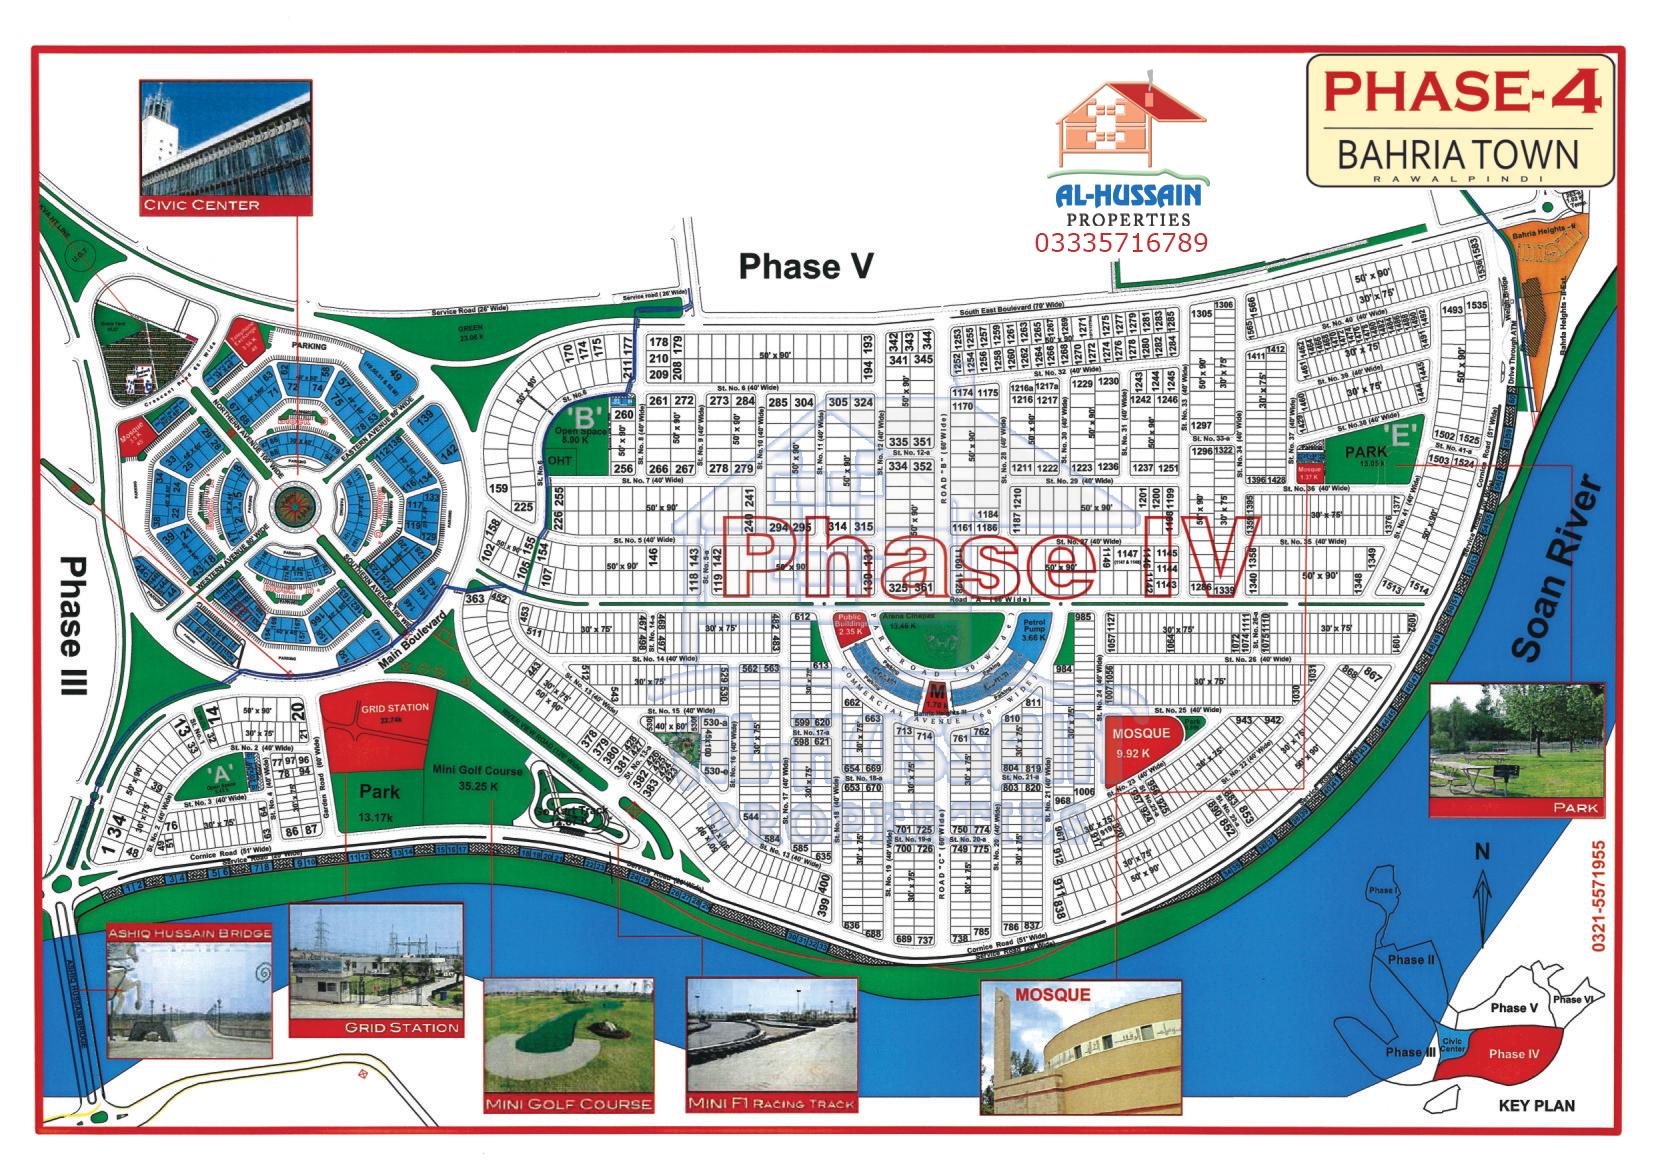 Phase 4 Bahria Town Rawalpindi Islamabad